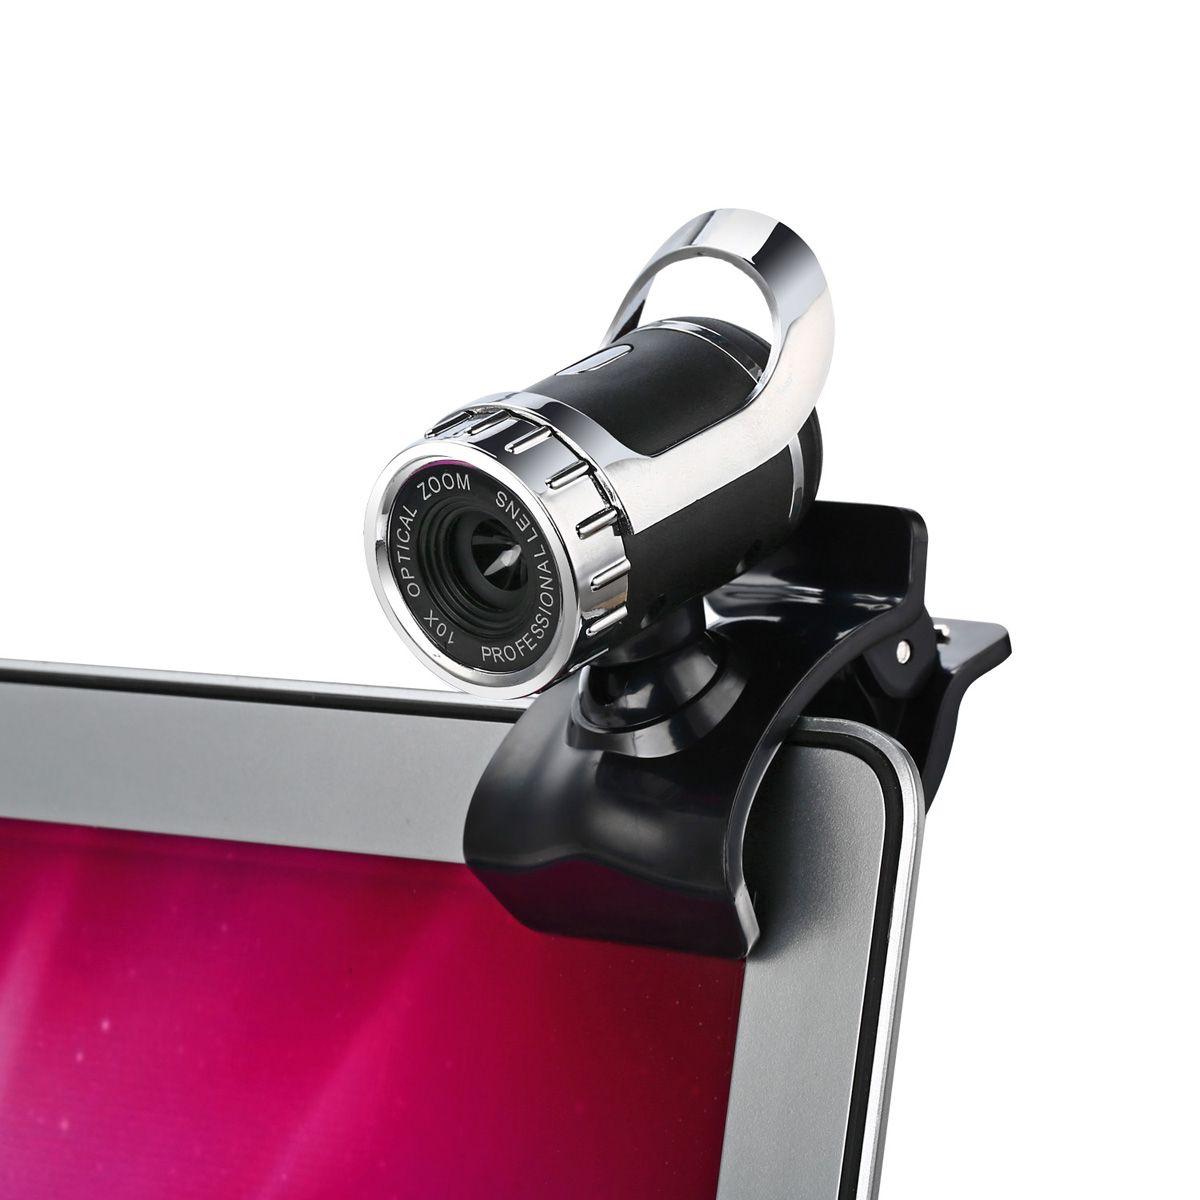 Newest 360 Degree Webcam USB 12 Megapixel HD Camera Web Cam MIC Clip-on For Skype Computer Laptop Desktop High Quality